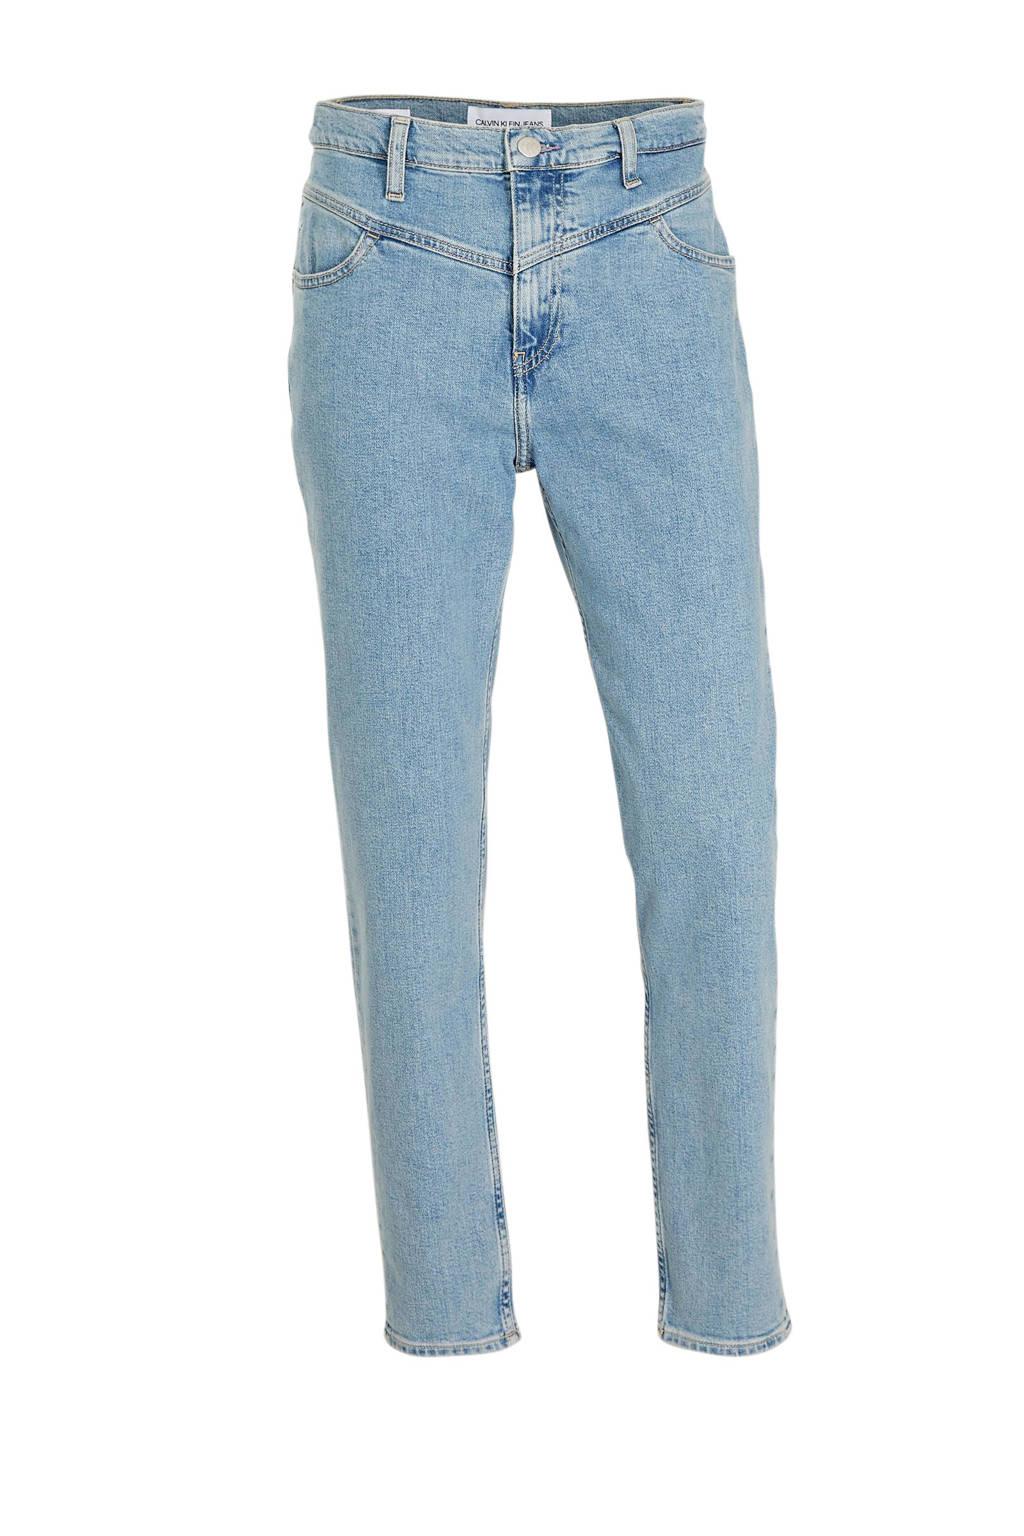 CALVIN KLEIN JEANS high waist mom jeans light blue yoke, Light blue yoke